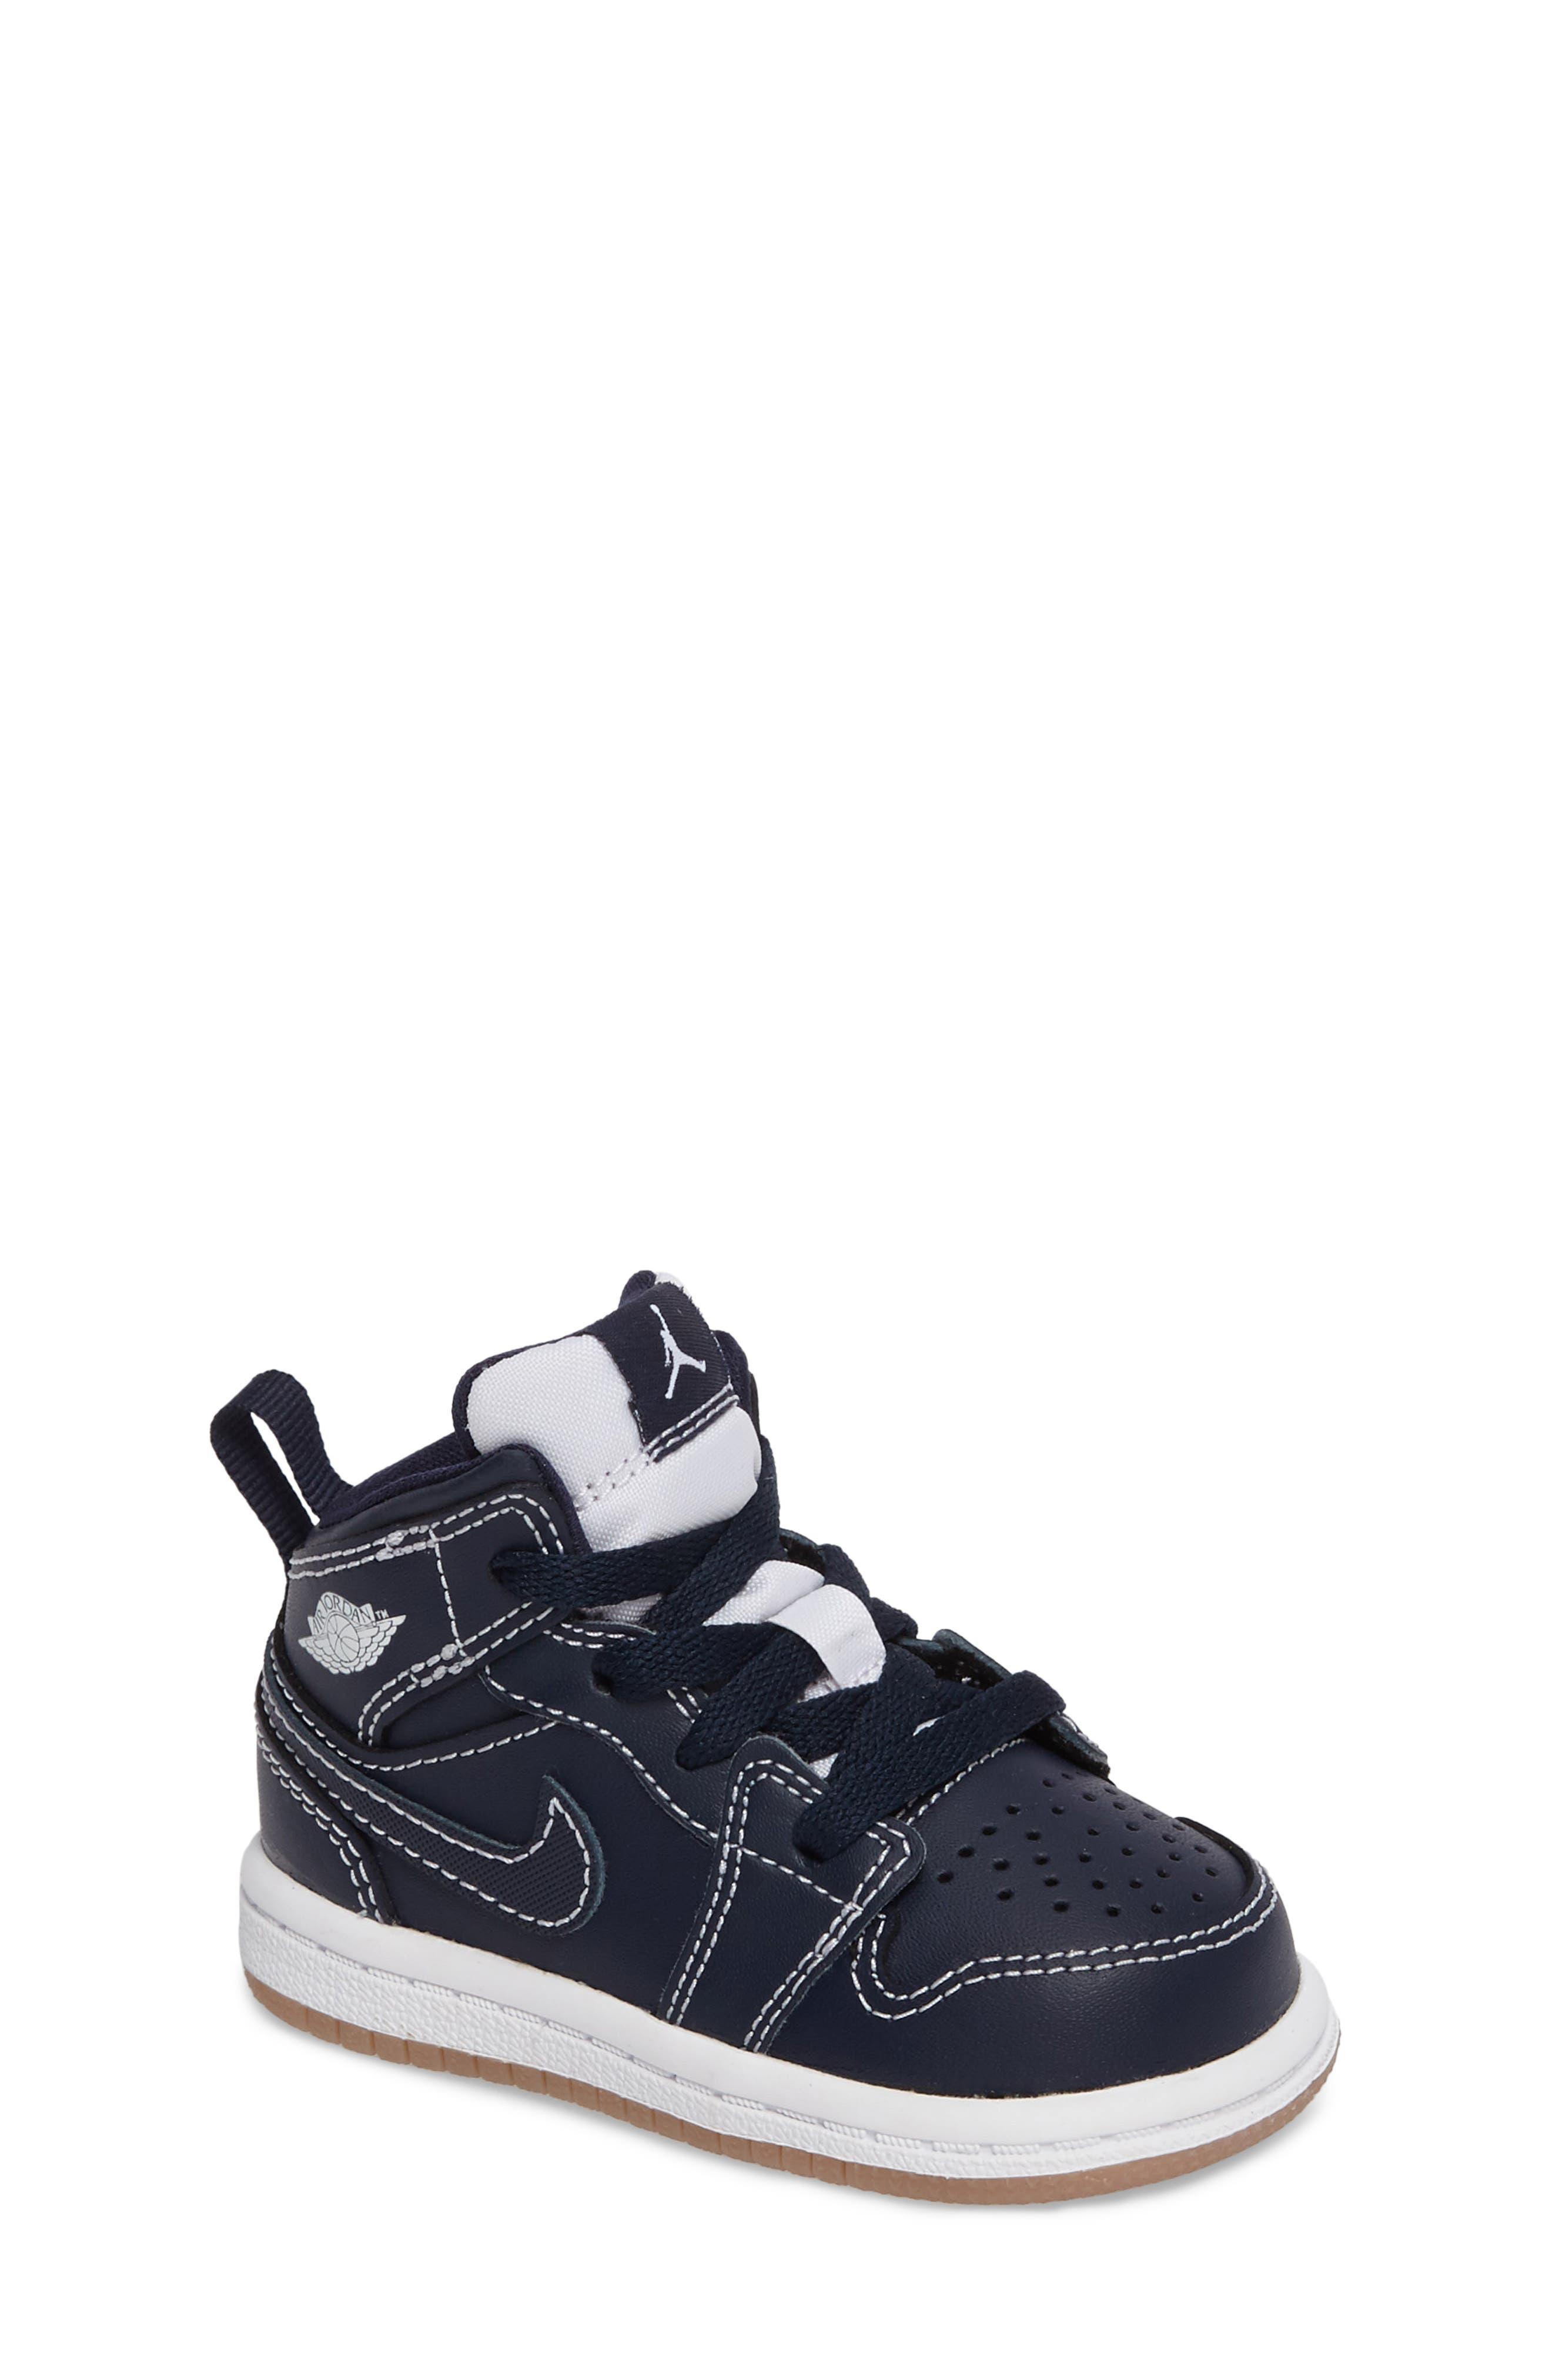 NIKE Air Jordan 1 Mid Sneaker